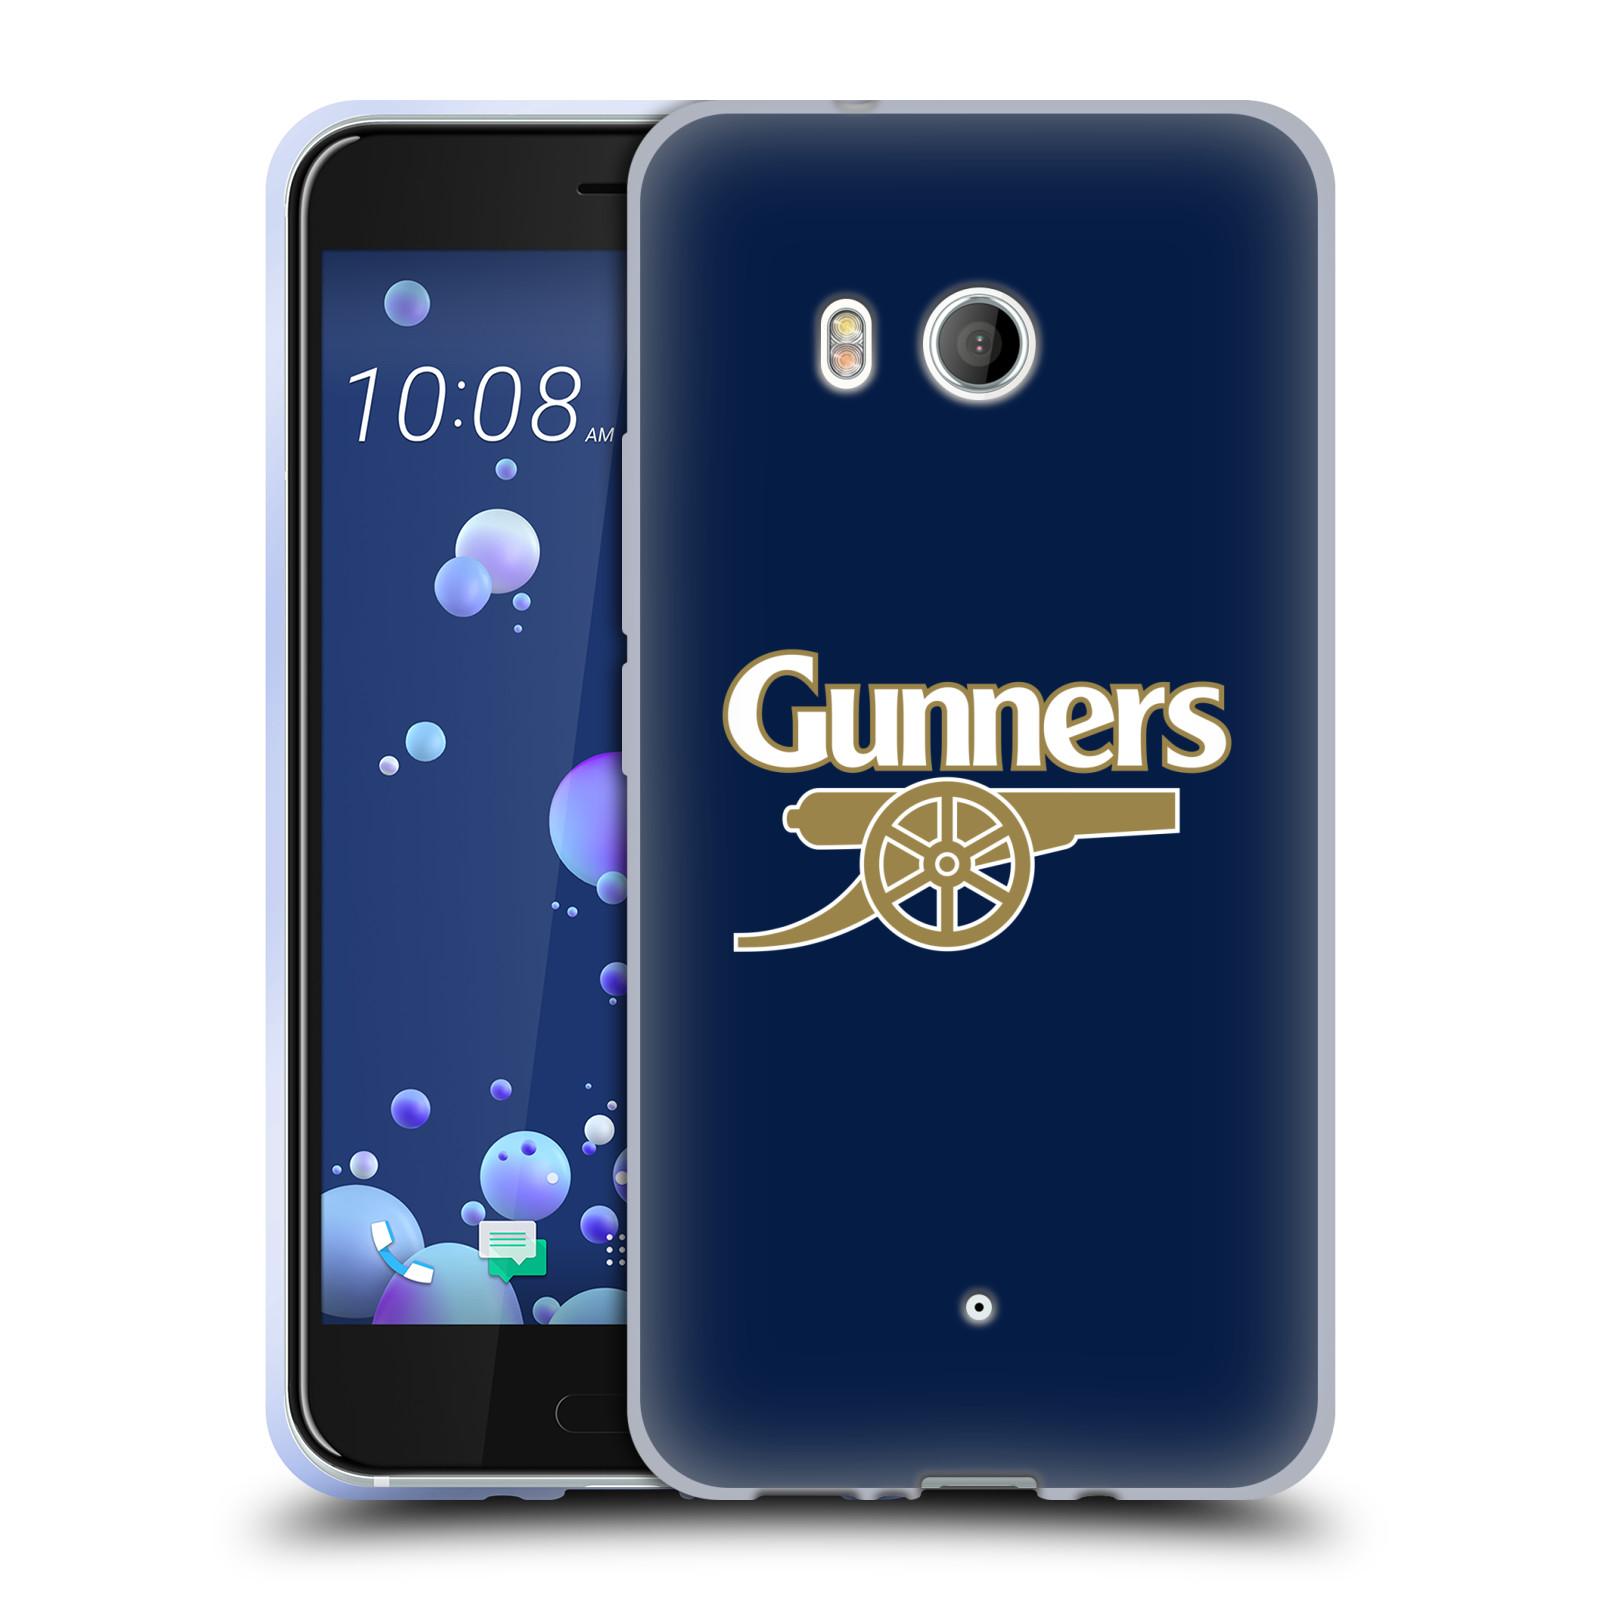 Silikonové pouzdro na mobil HTC U11 - Head Case - Arsenal FC - Gunners